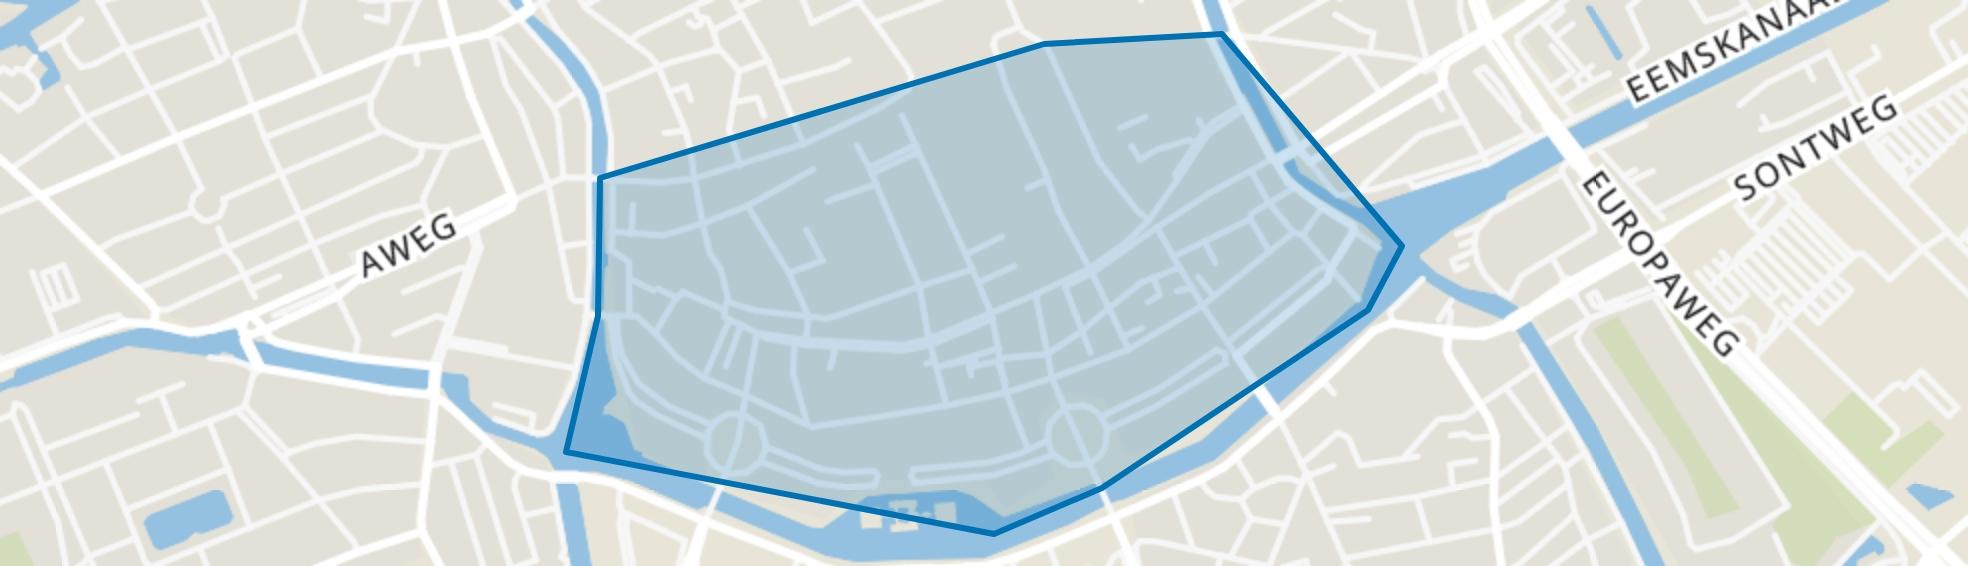 Binnenstad-Zuid, Groningen map